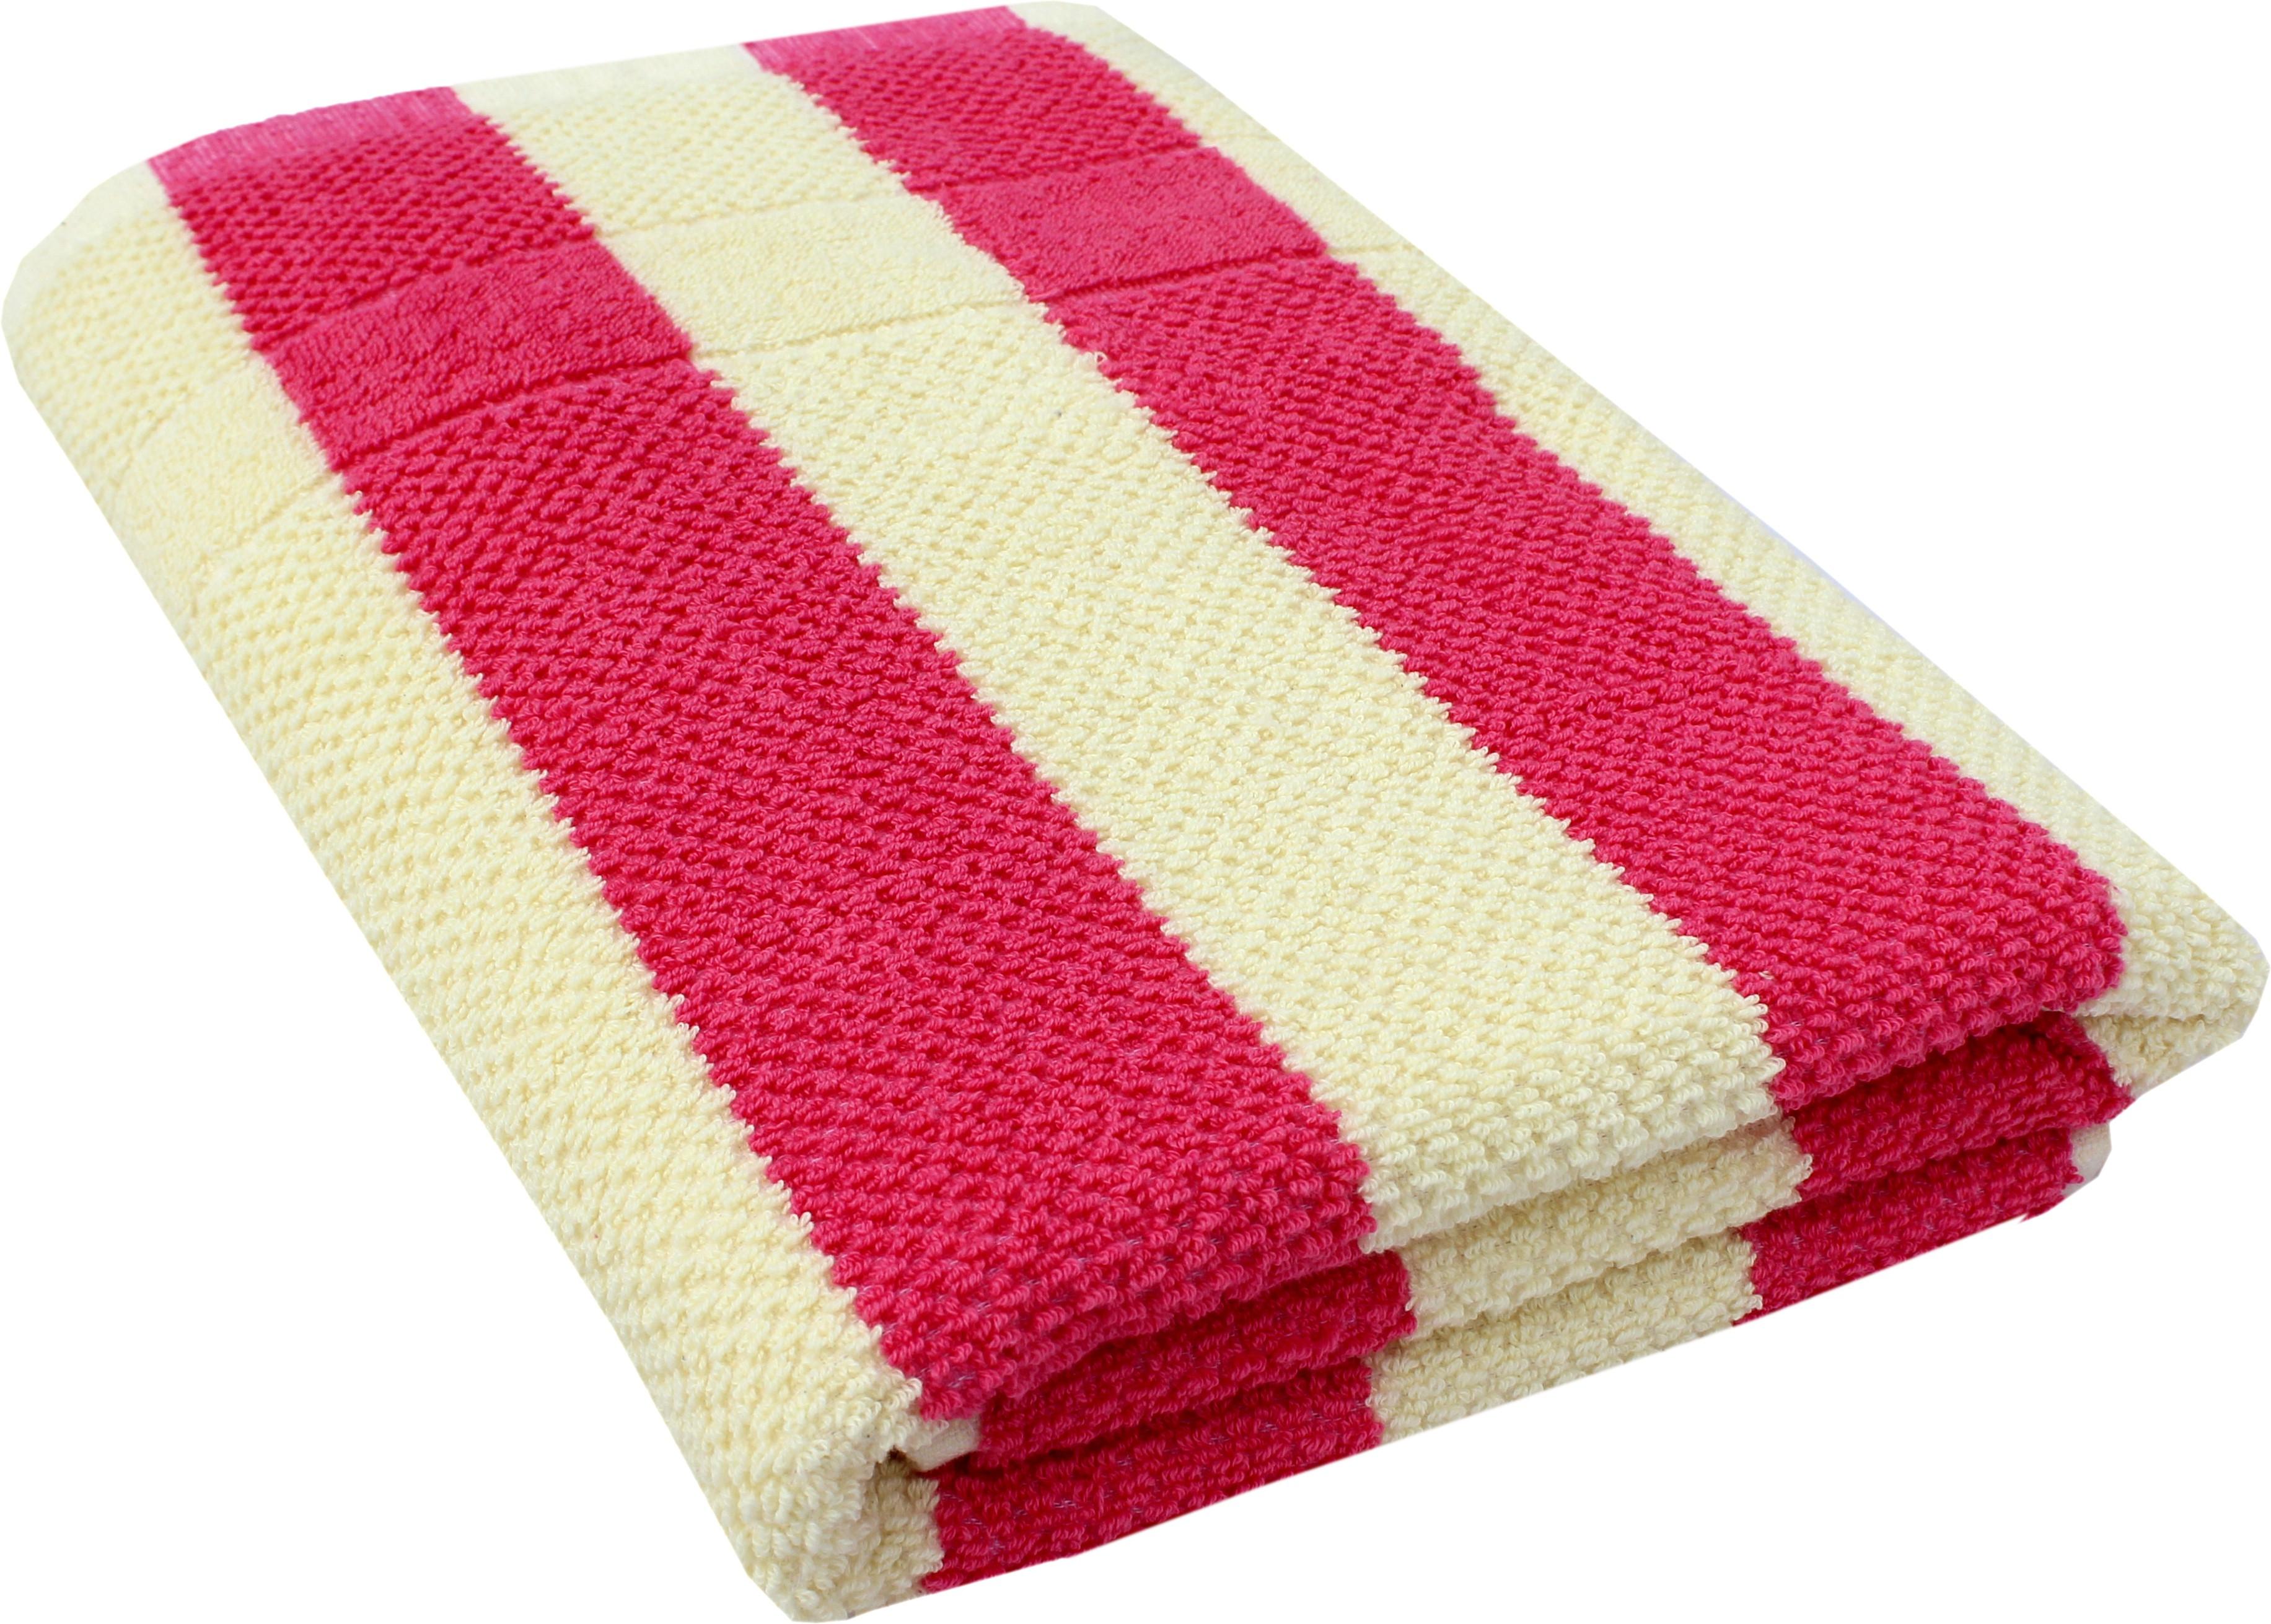 Mandhania Cotton Bath Towel